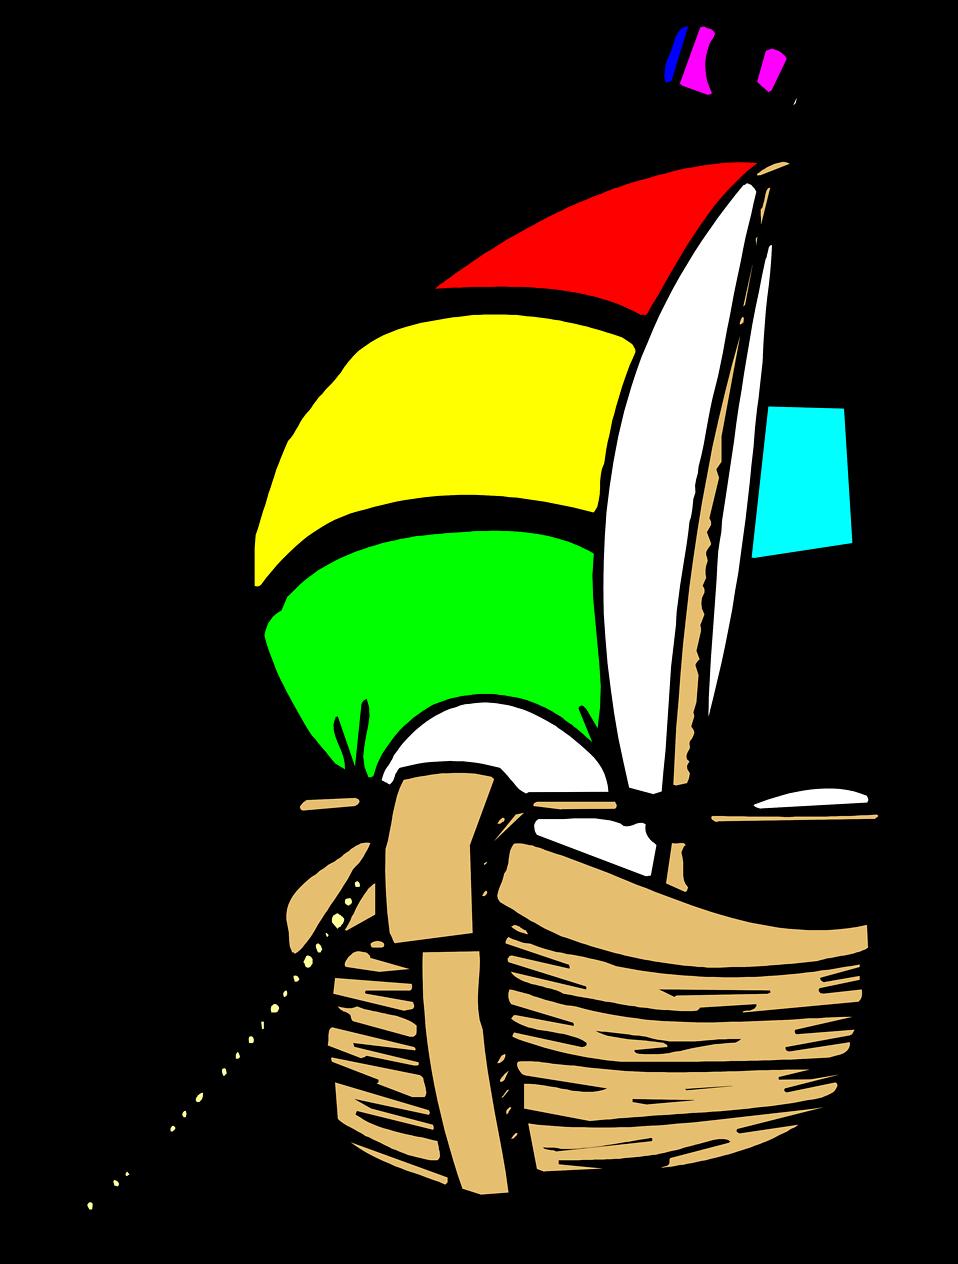 Illustration of an anchored sailboat : Free Stock Photo